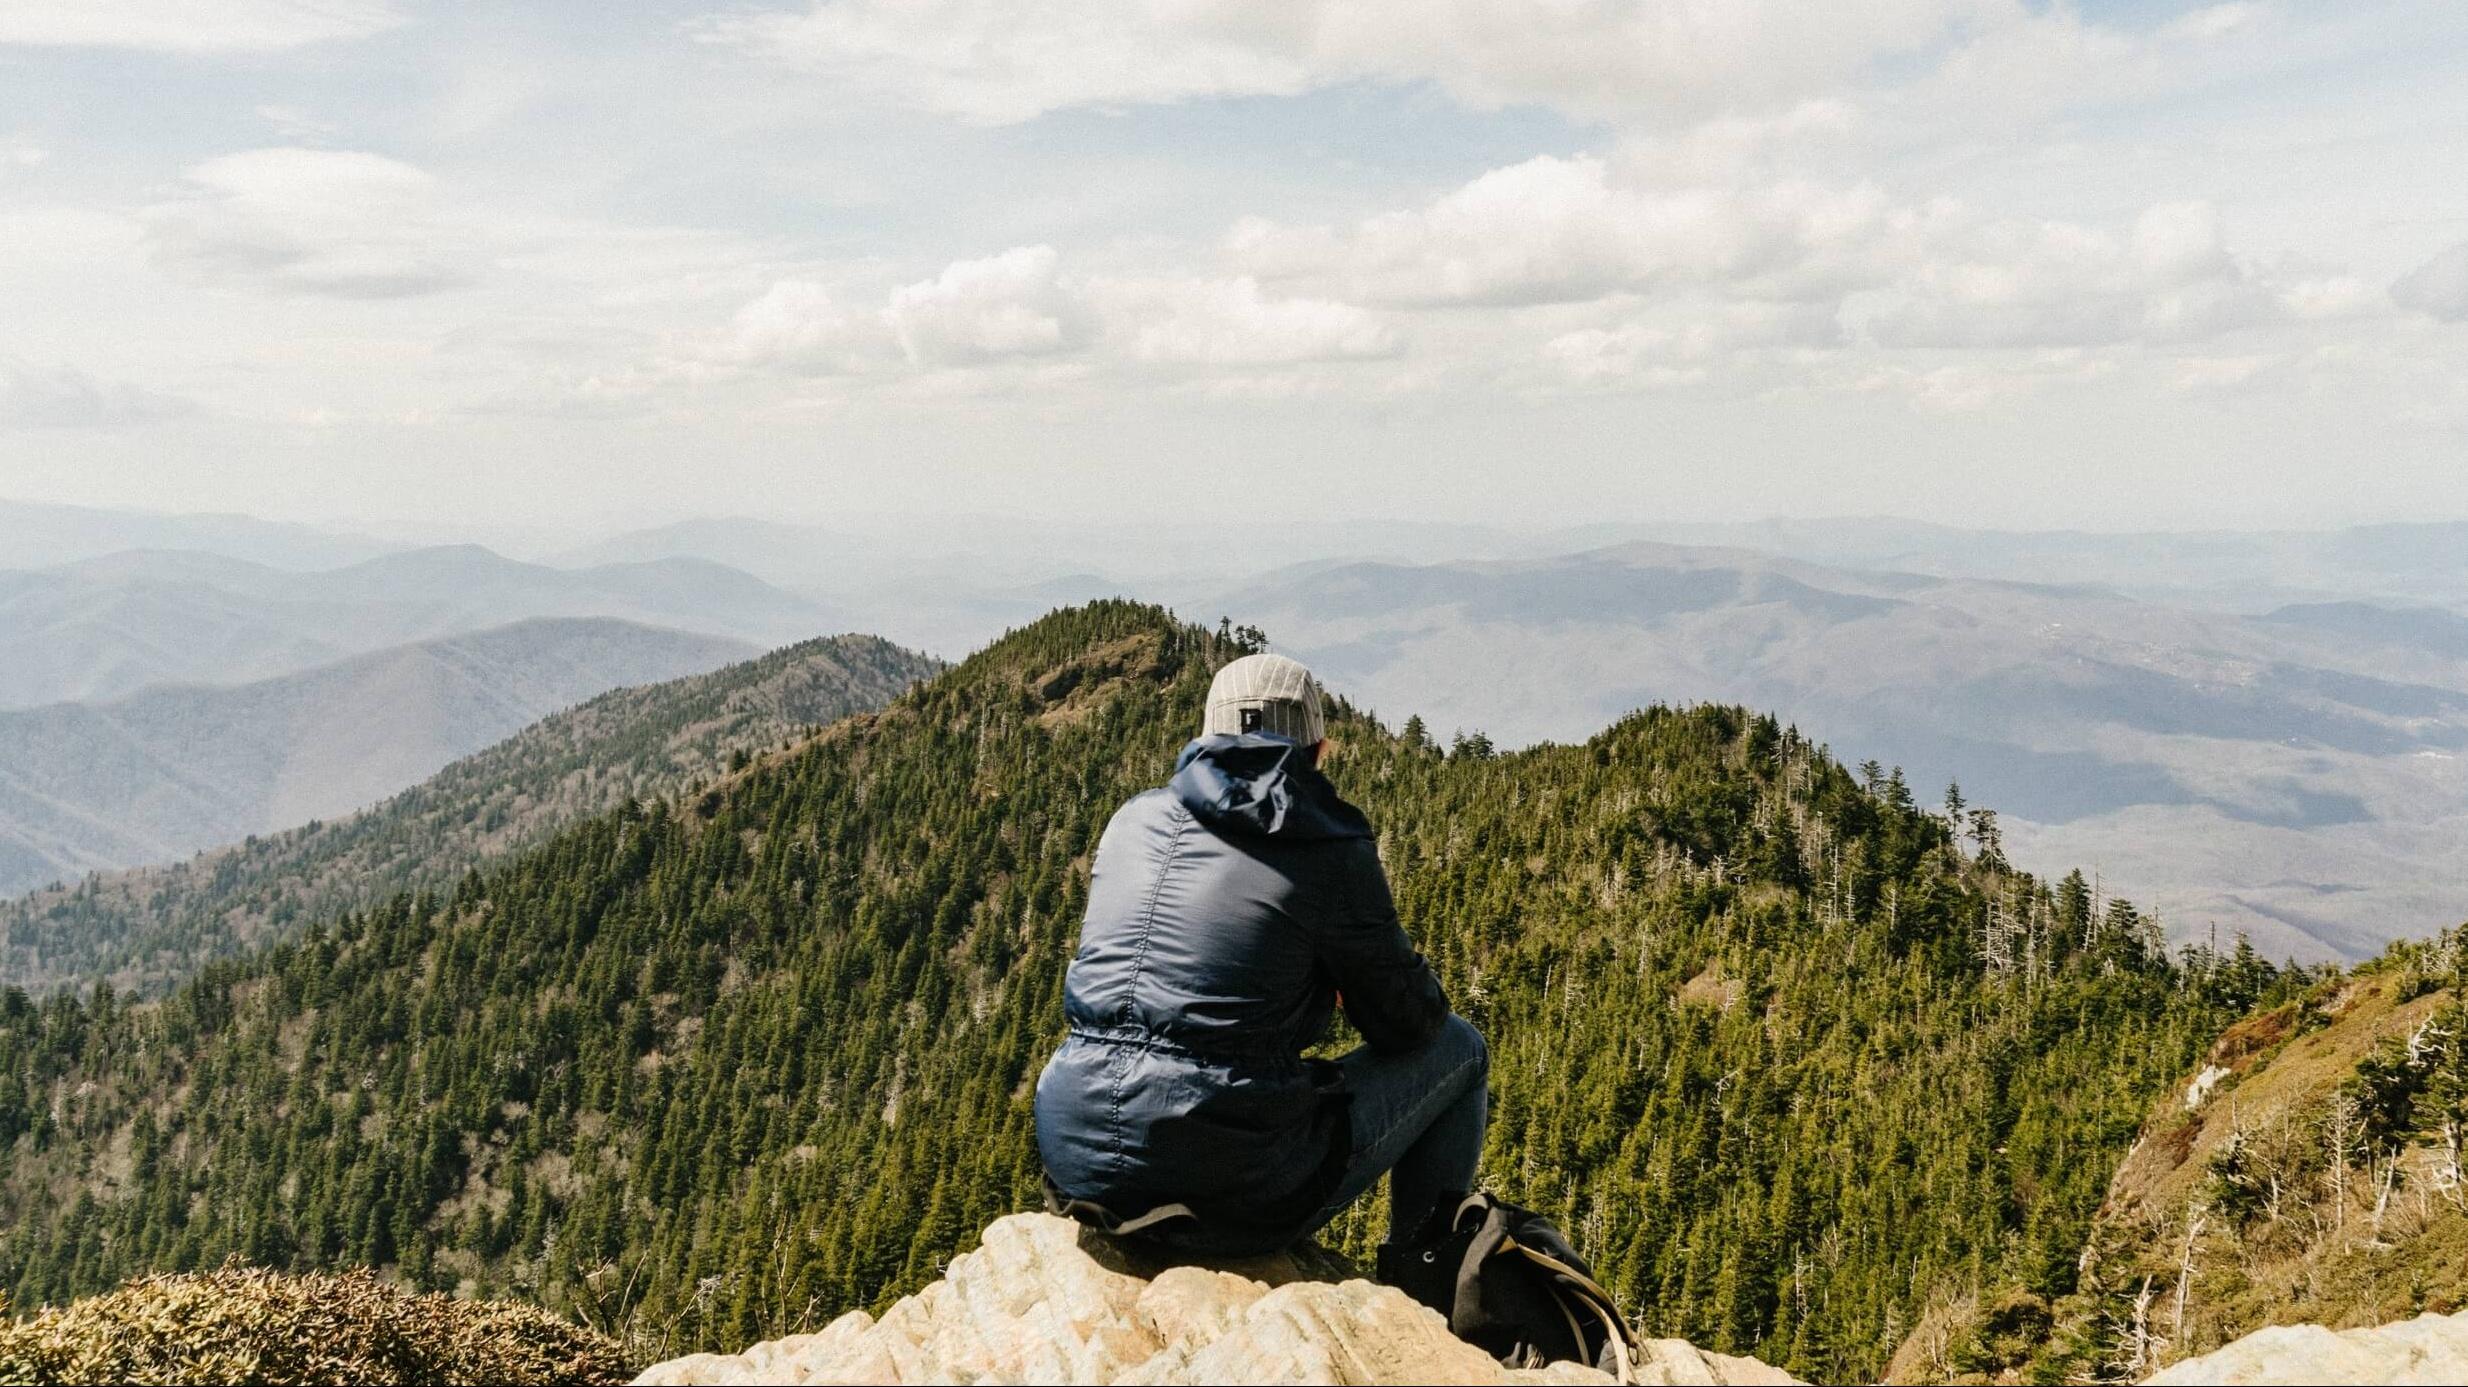 sitting mountaintop